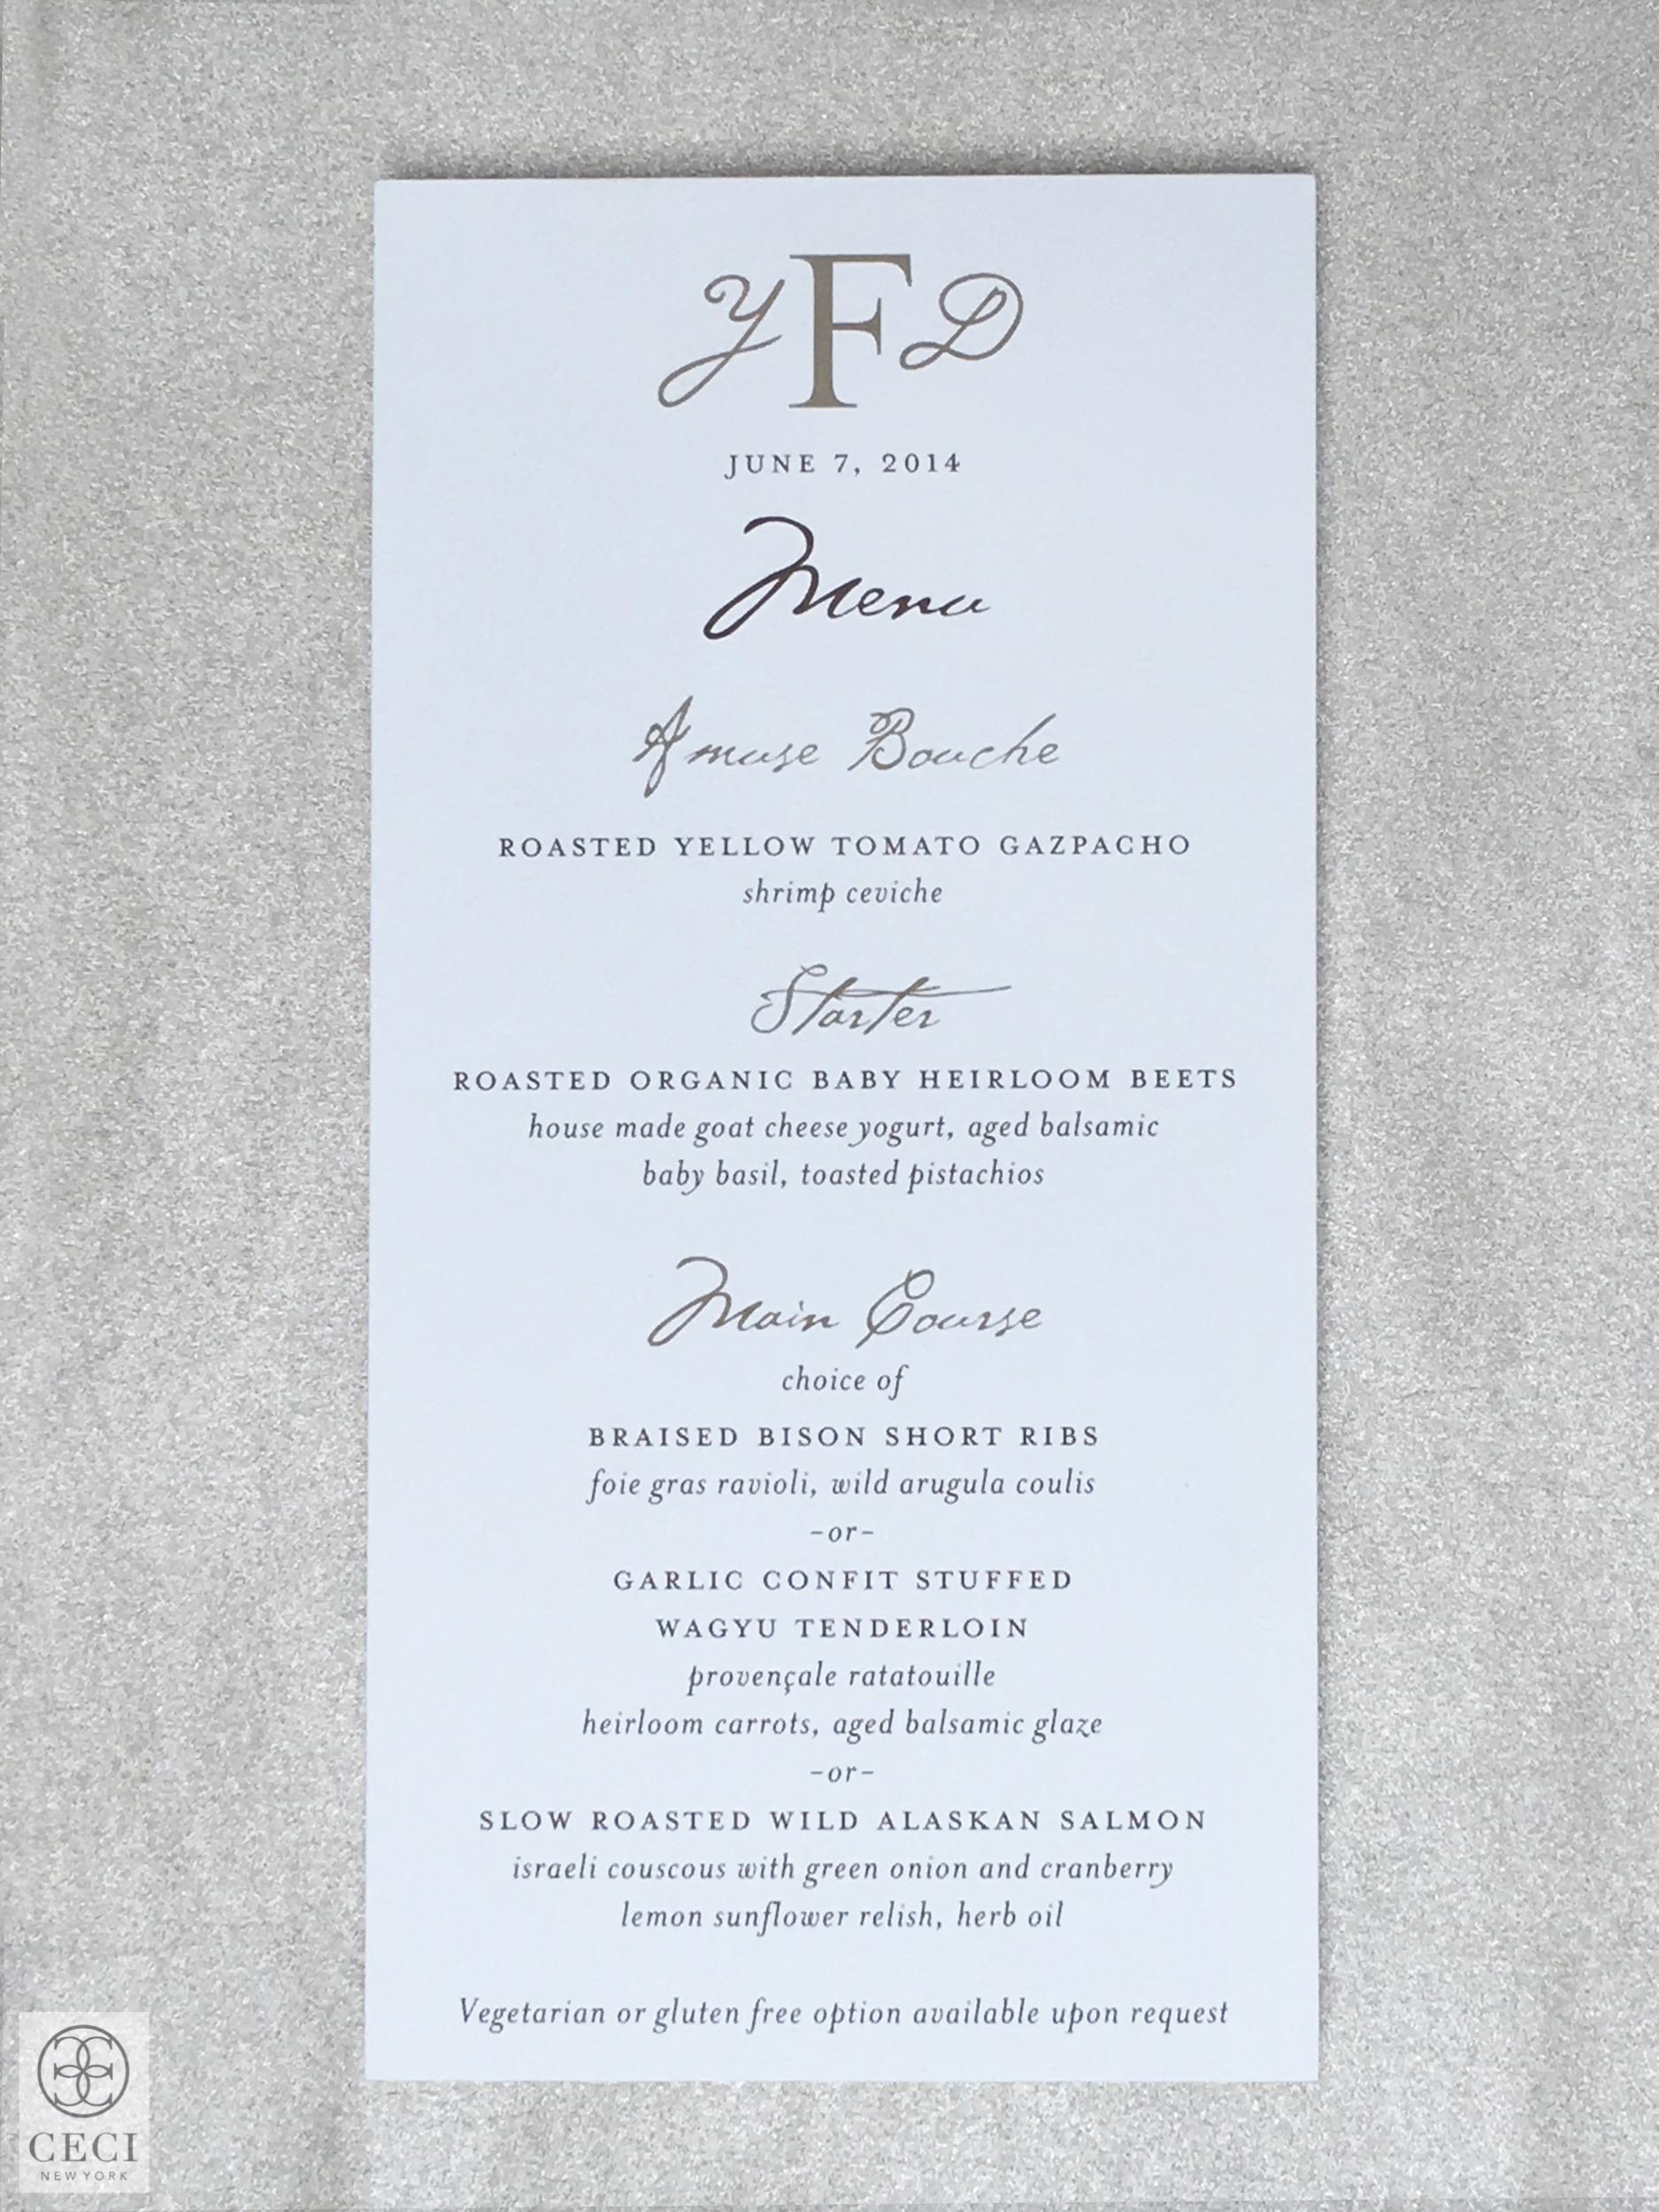 Ceci_New_York_Lyndsey_Hamilton_Events_Invitations_Wedding_Amangani_Elegance_Gold_Foil_Letterpress_Classic_Stamping_Custom_Couture_Personalized-22.jpg